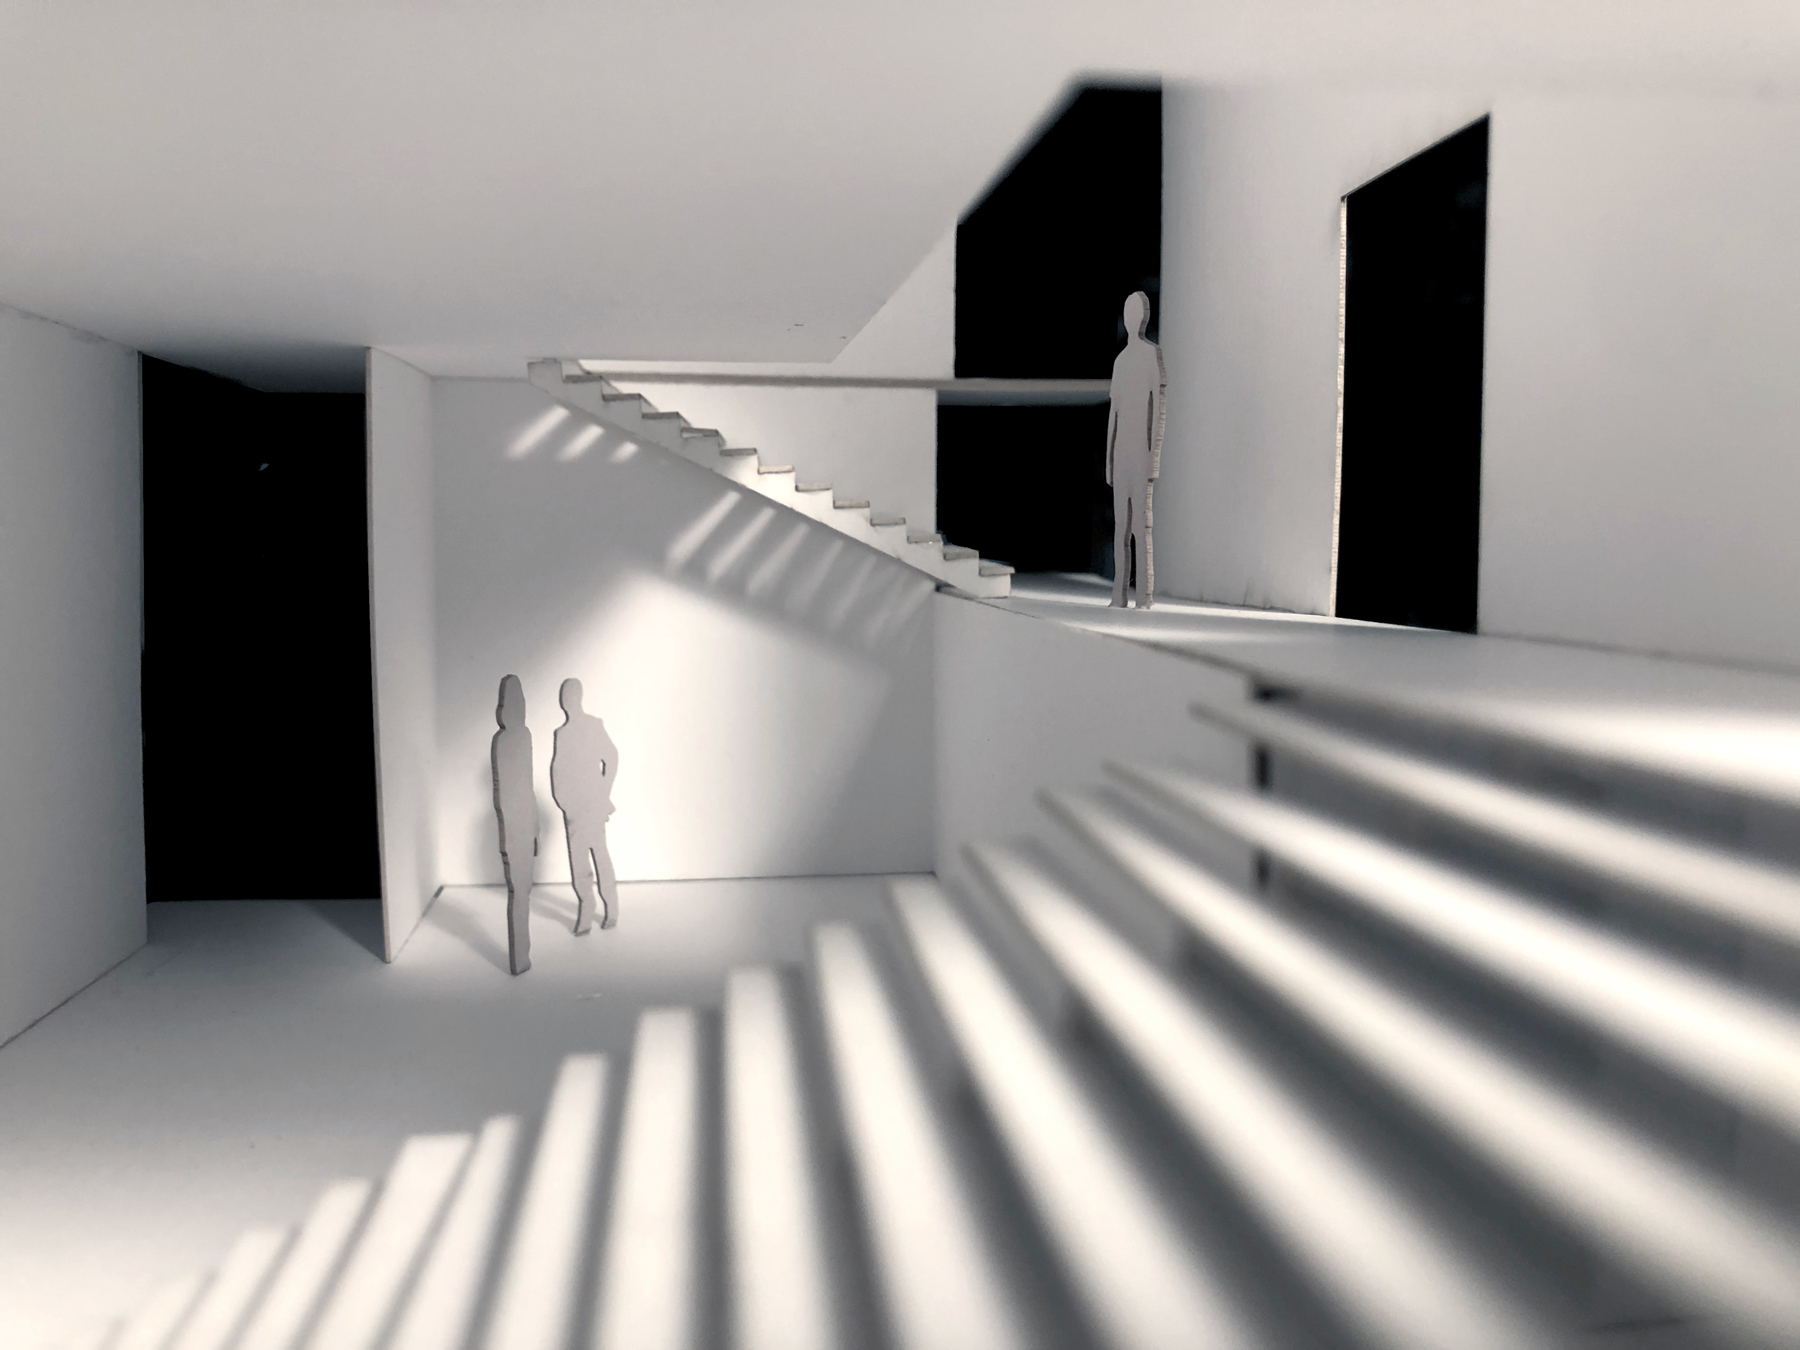 Scale, Occupancy, Movement - Tara Akdora